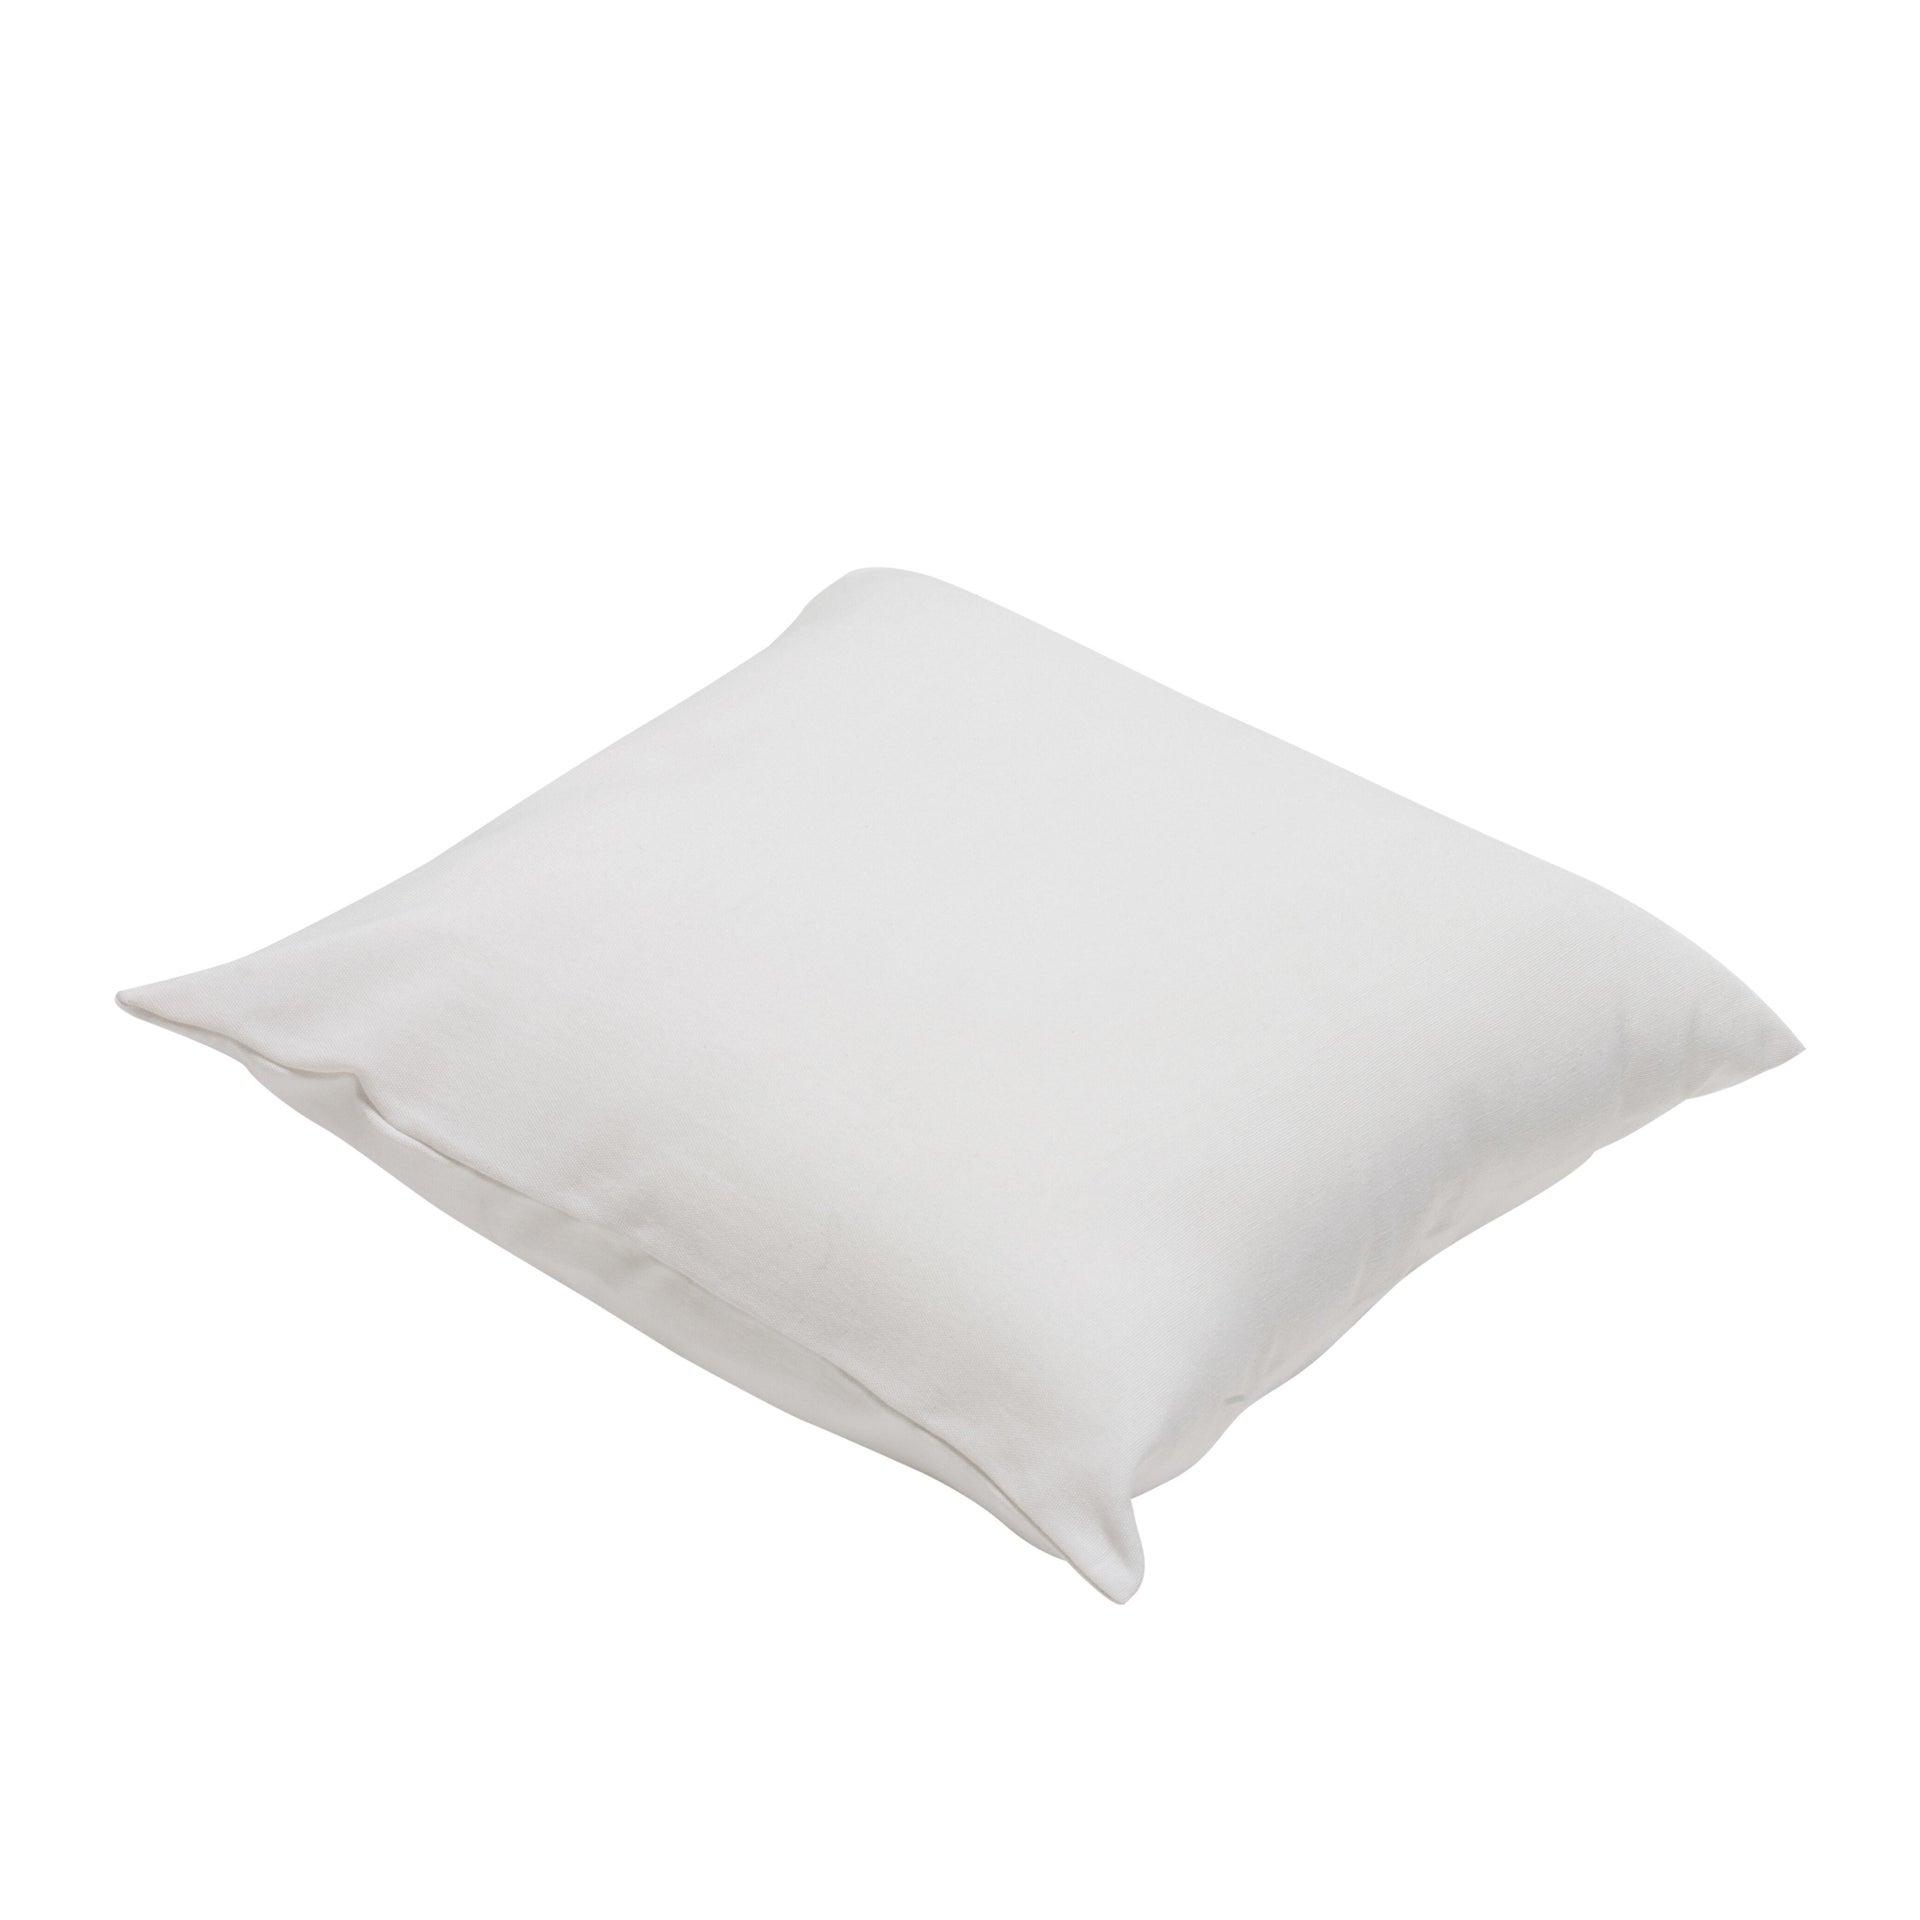 Cuscino INSPIRE Lea bianco 40x40 cm - 3